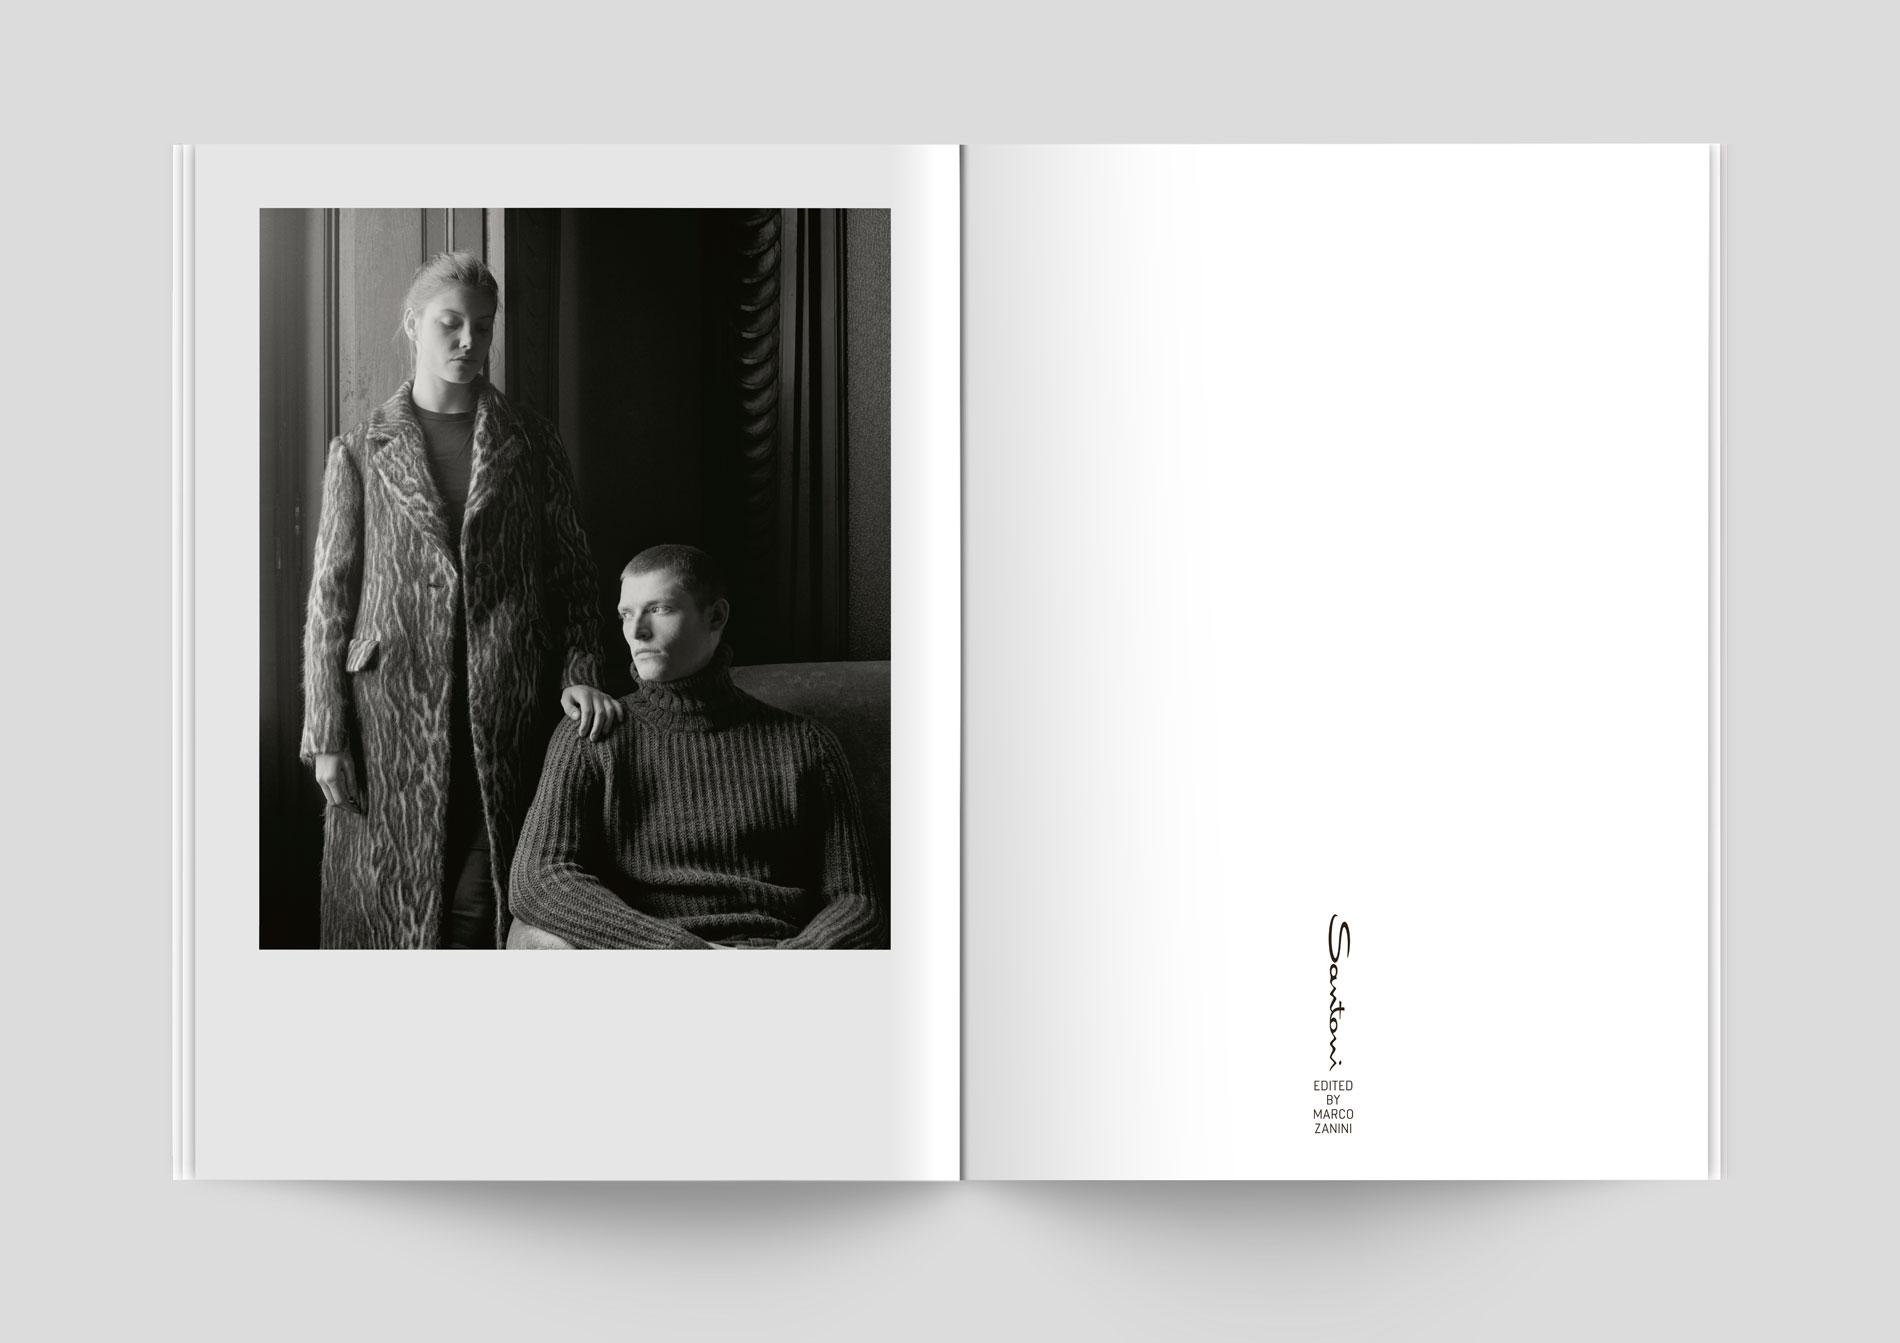 Santoni-Edited-by-Marco-Zanini-Ingar-Krauss-10